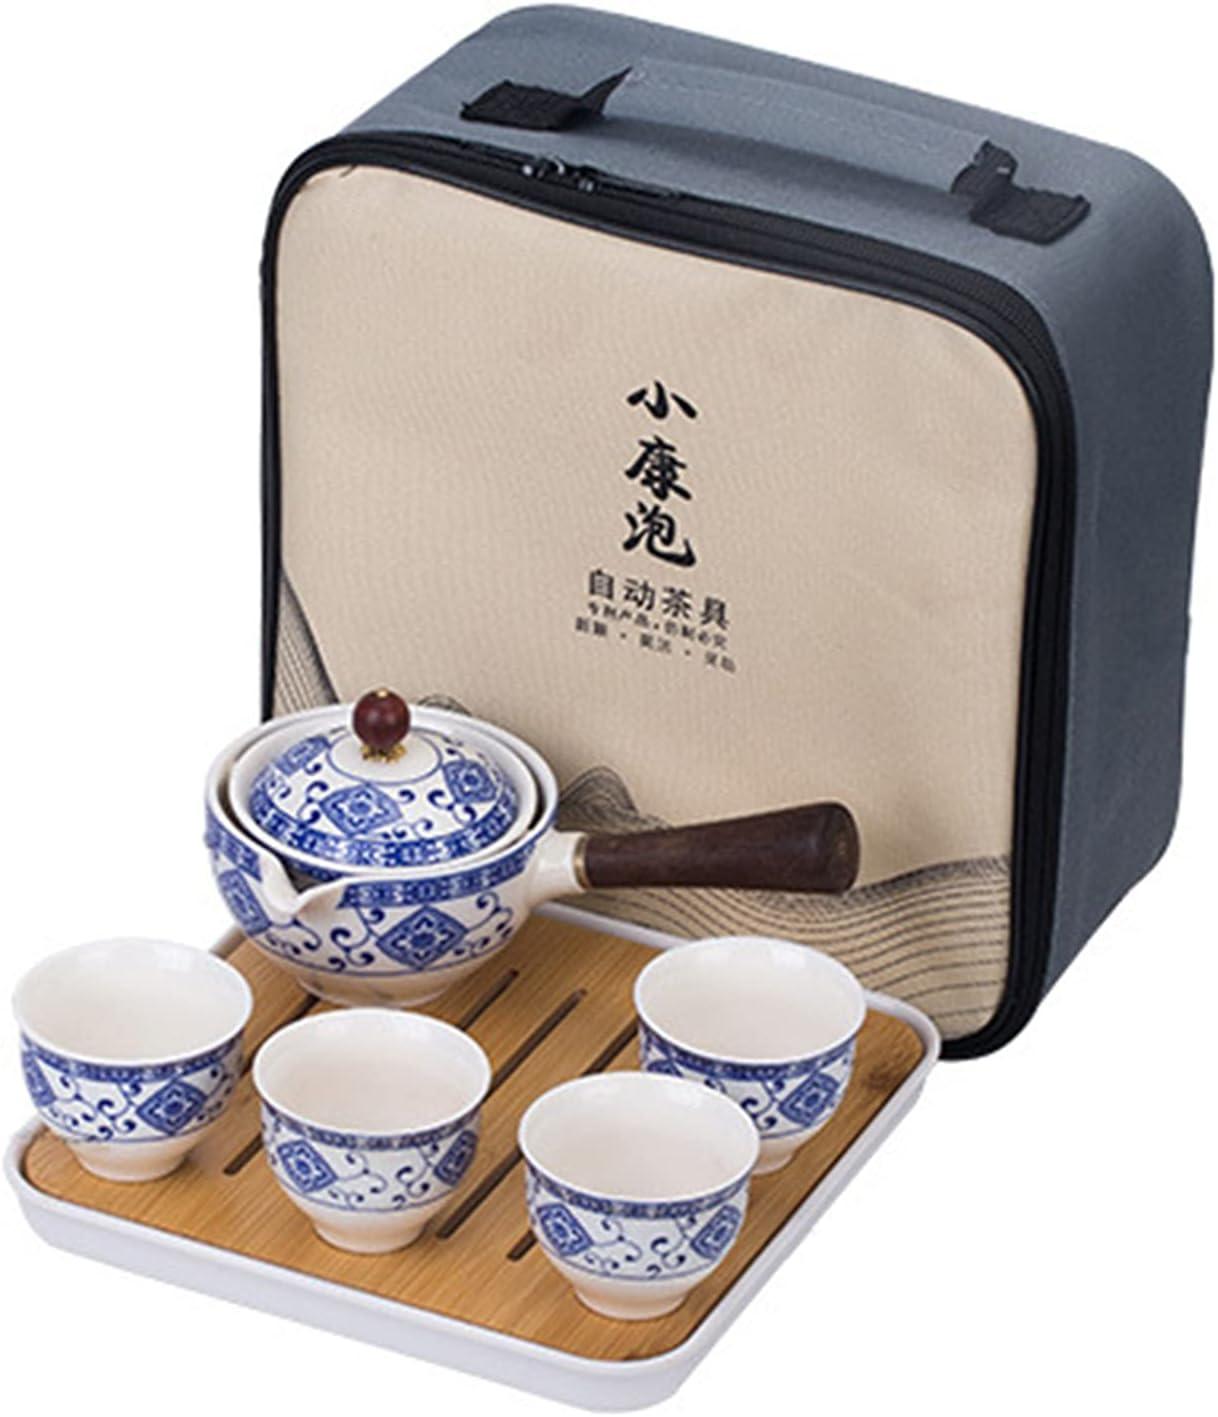 fanquare Blue and White Max 63% OFF Porcelain National uniform free shipping Tea Travel Handm Portable Set